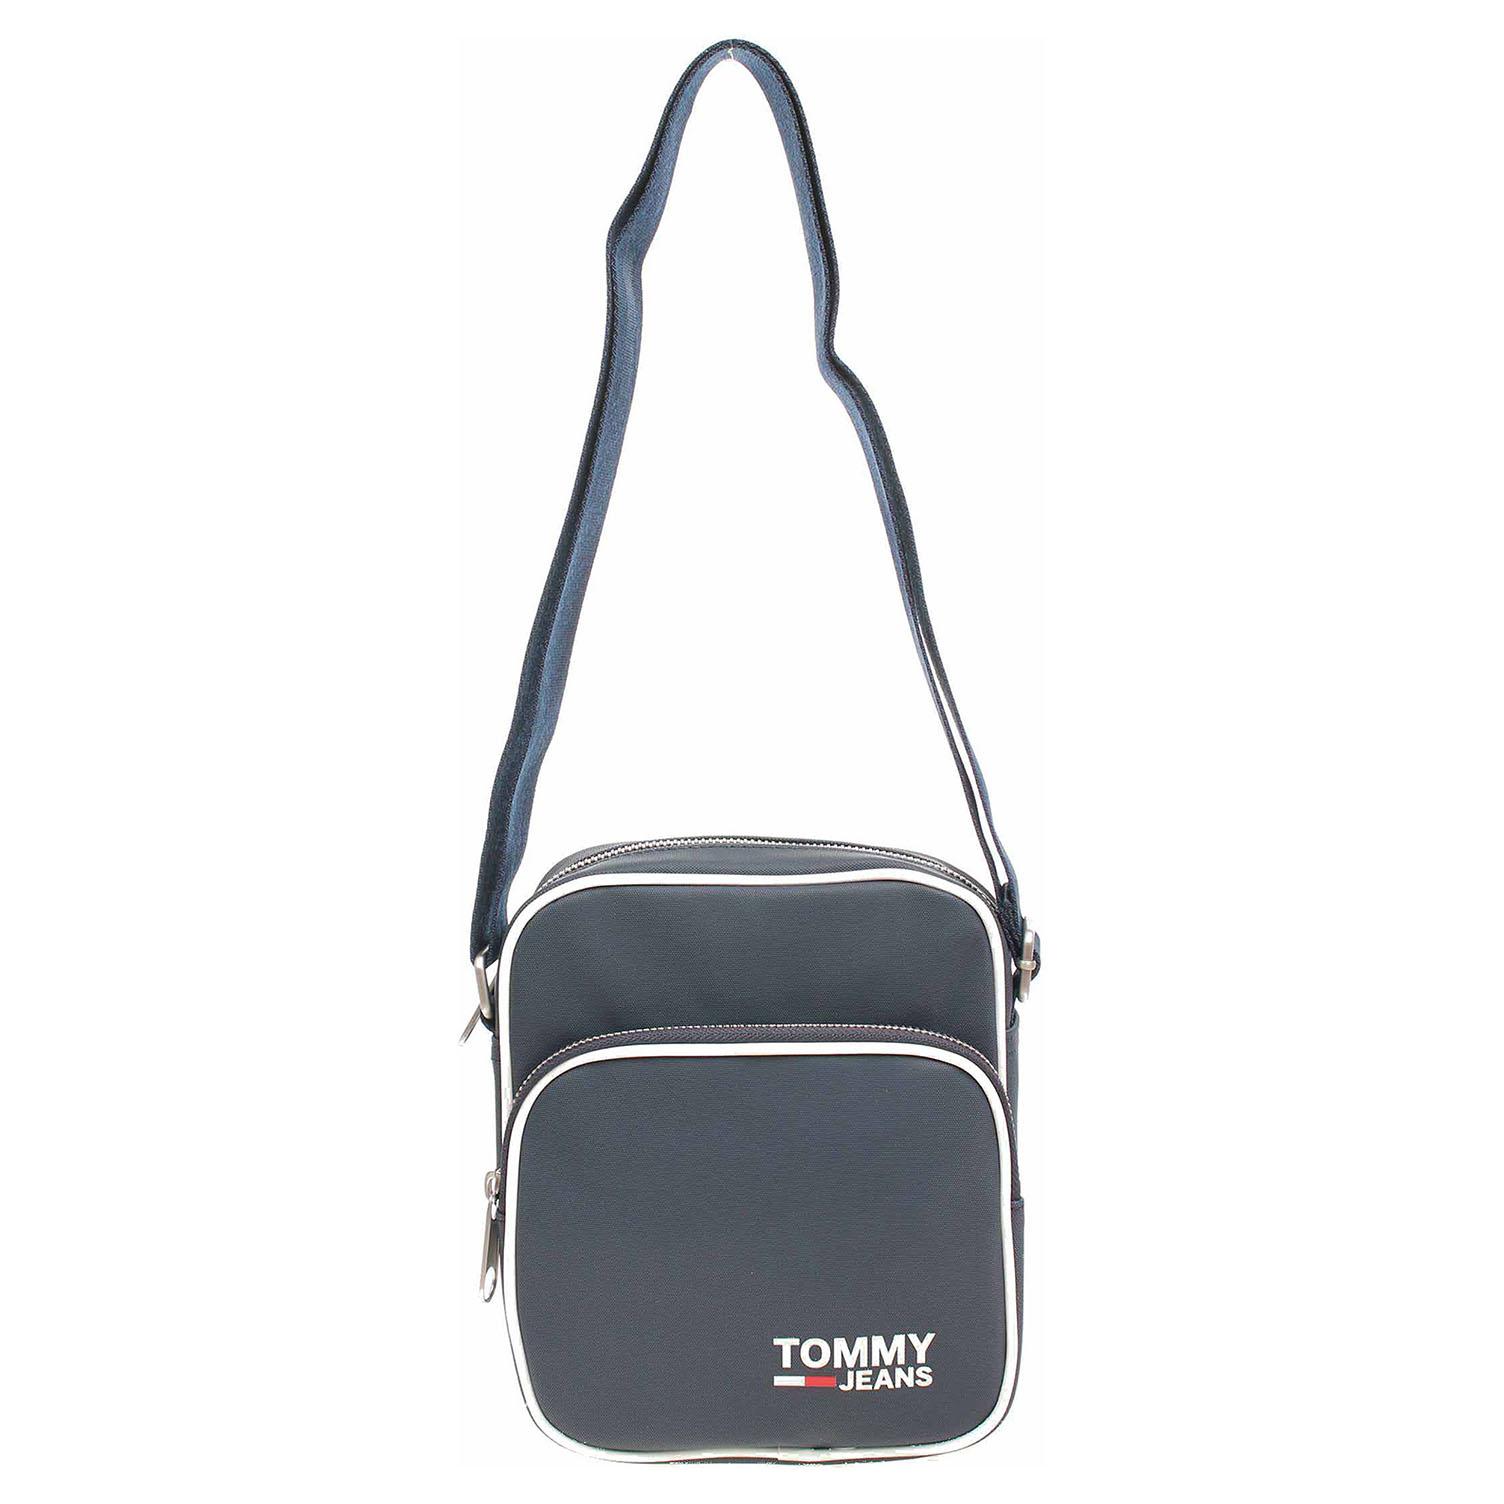 Tommy Hilfiger pánská taška AM0AM04412 496 black iris AM0AM04412 496 1